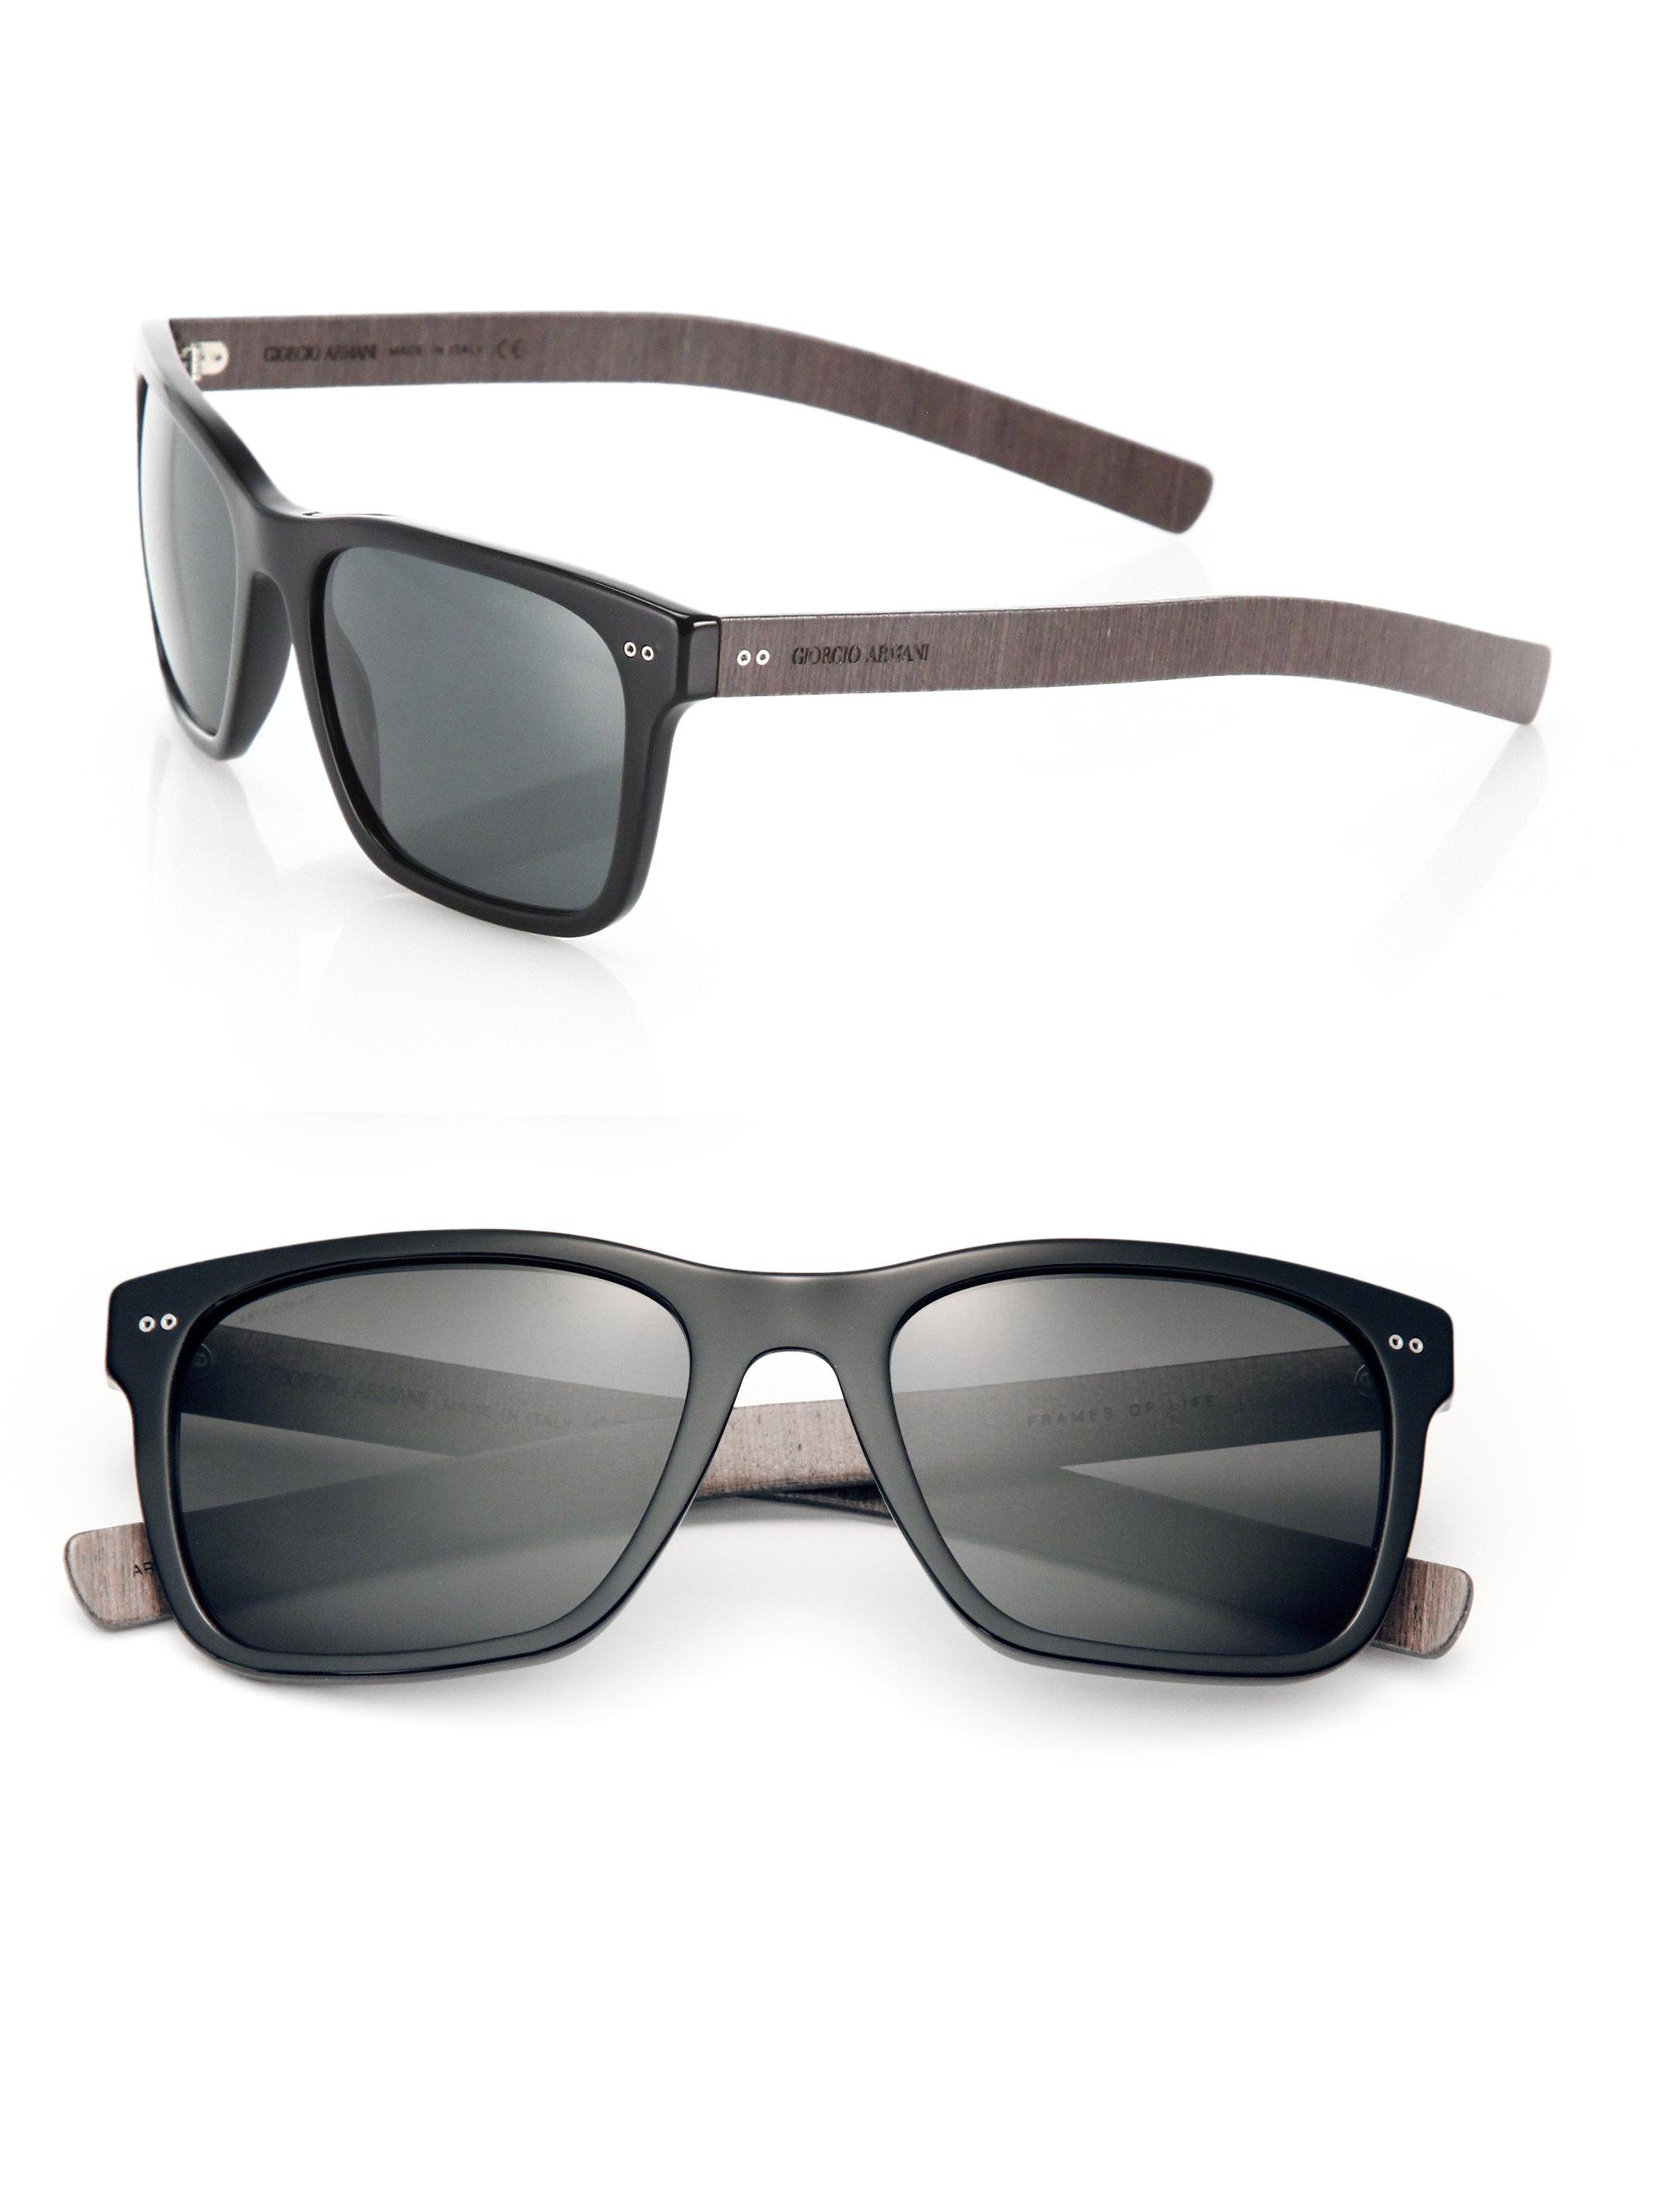 Sunglasses Armani 2015 | Louisiana Bucket Brigade